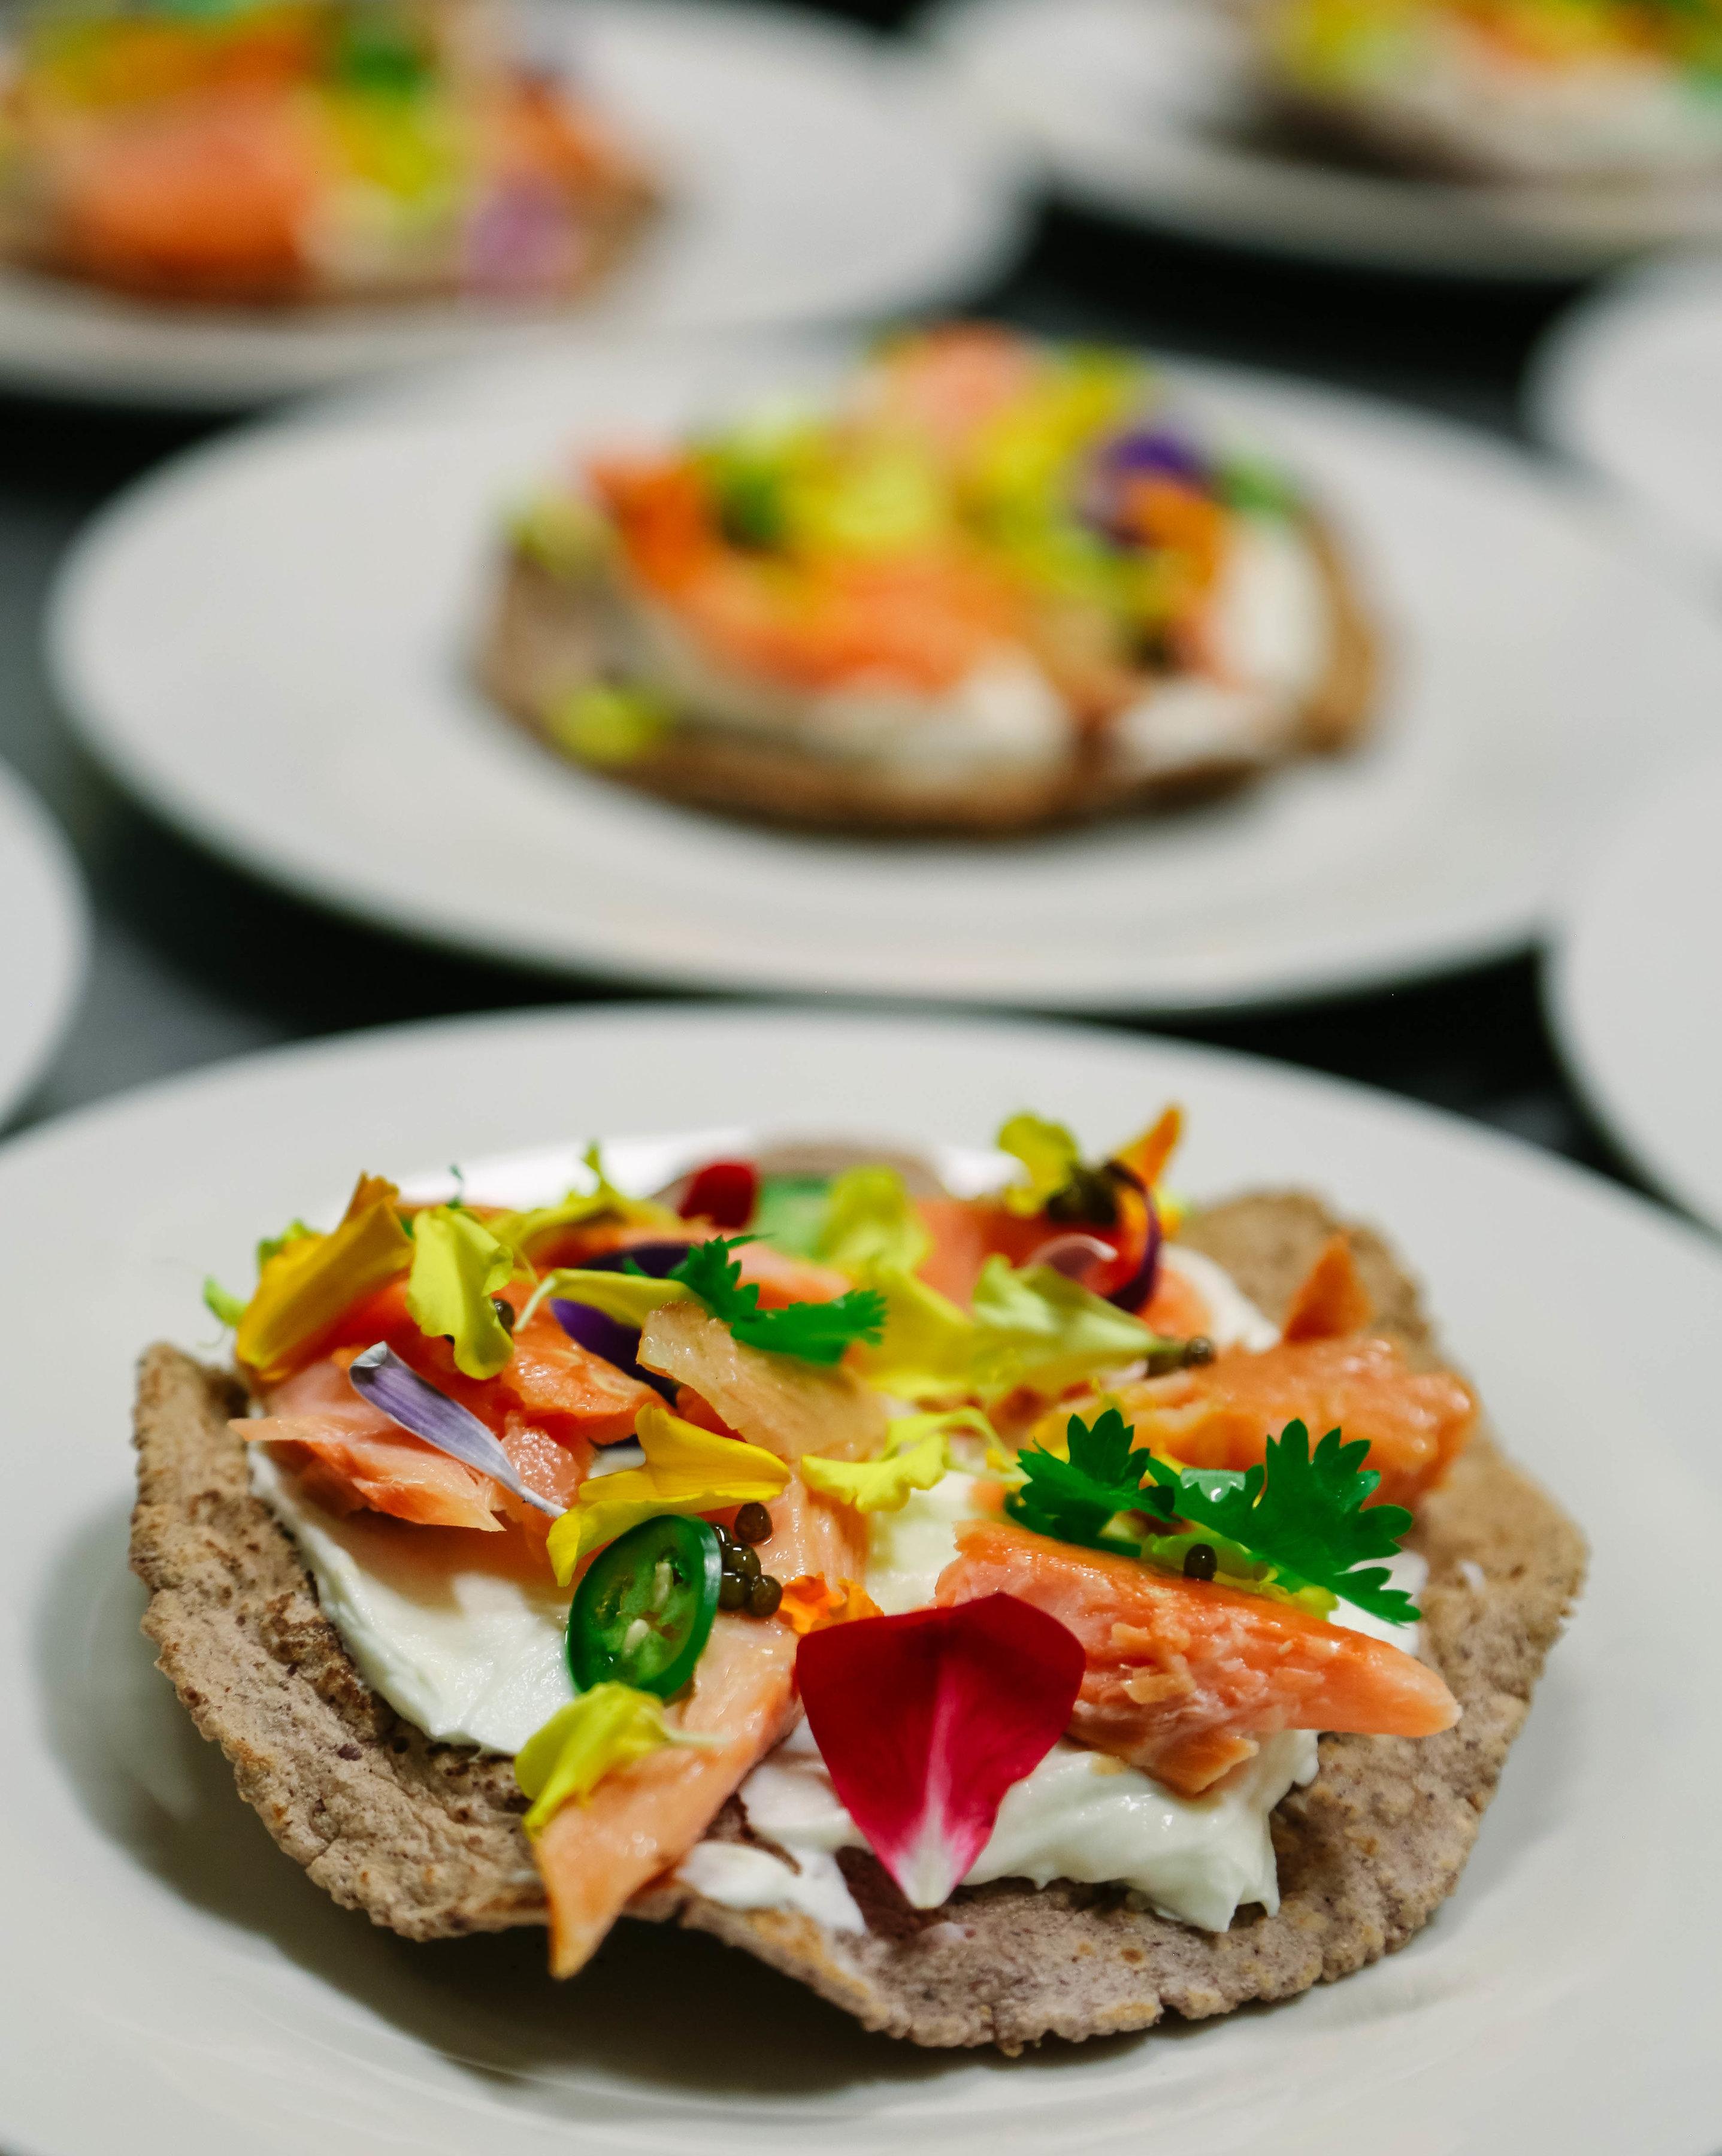 A colorful tostada from Amparo Fondita